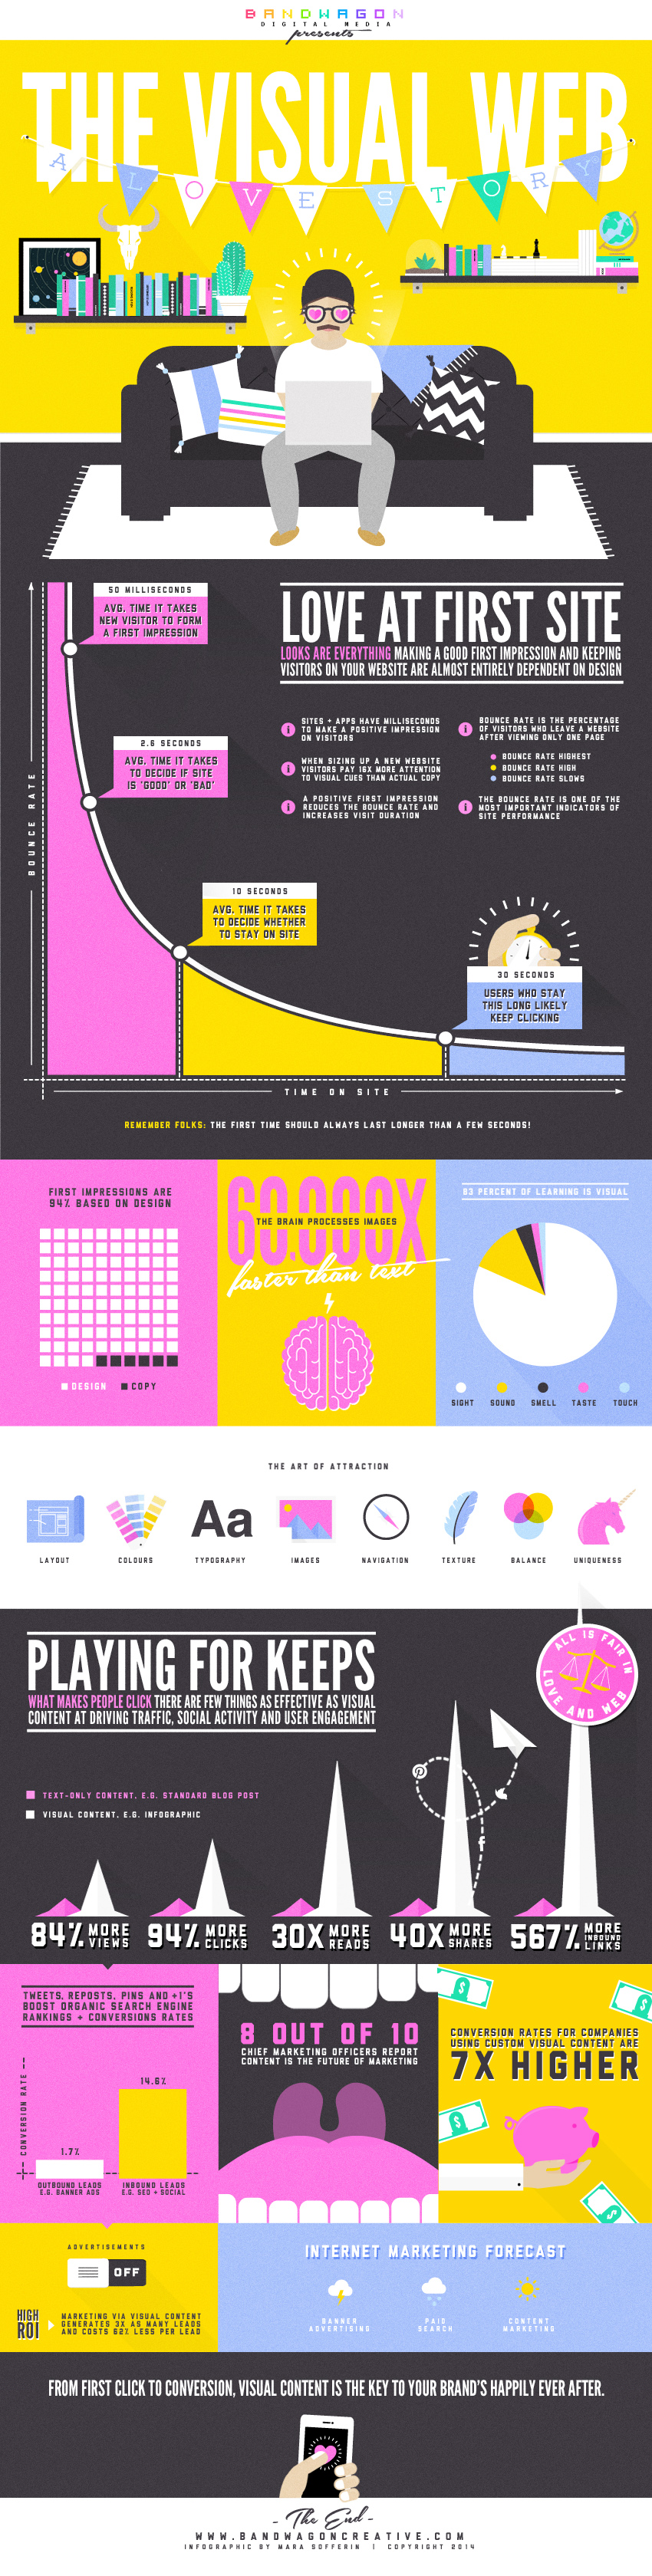 Visual_Web_Infographic1